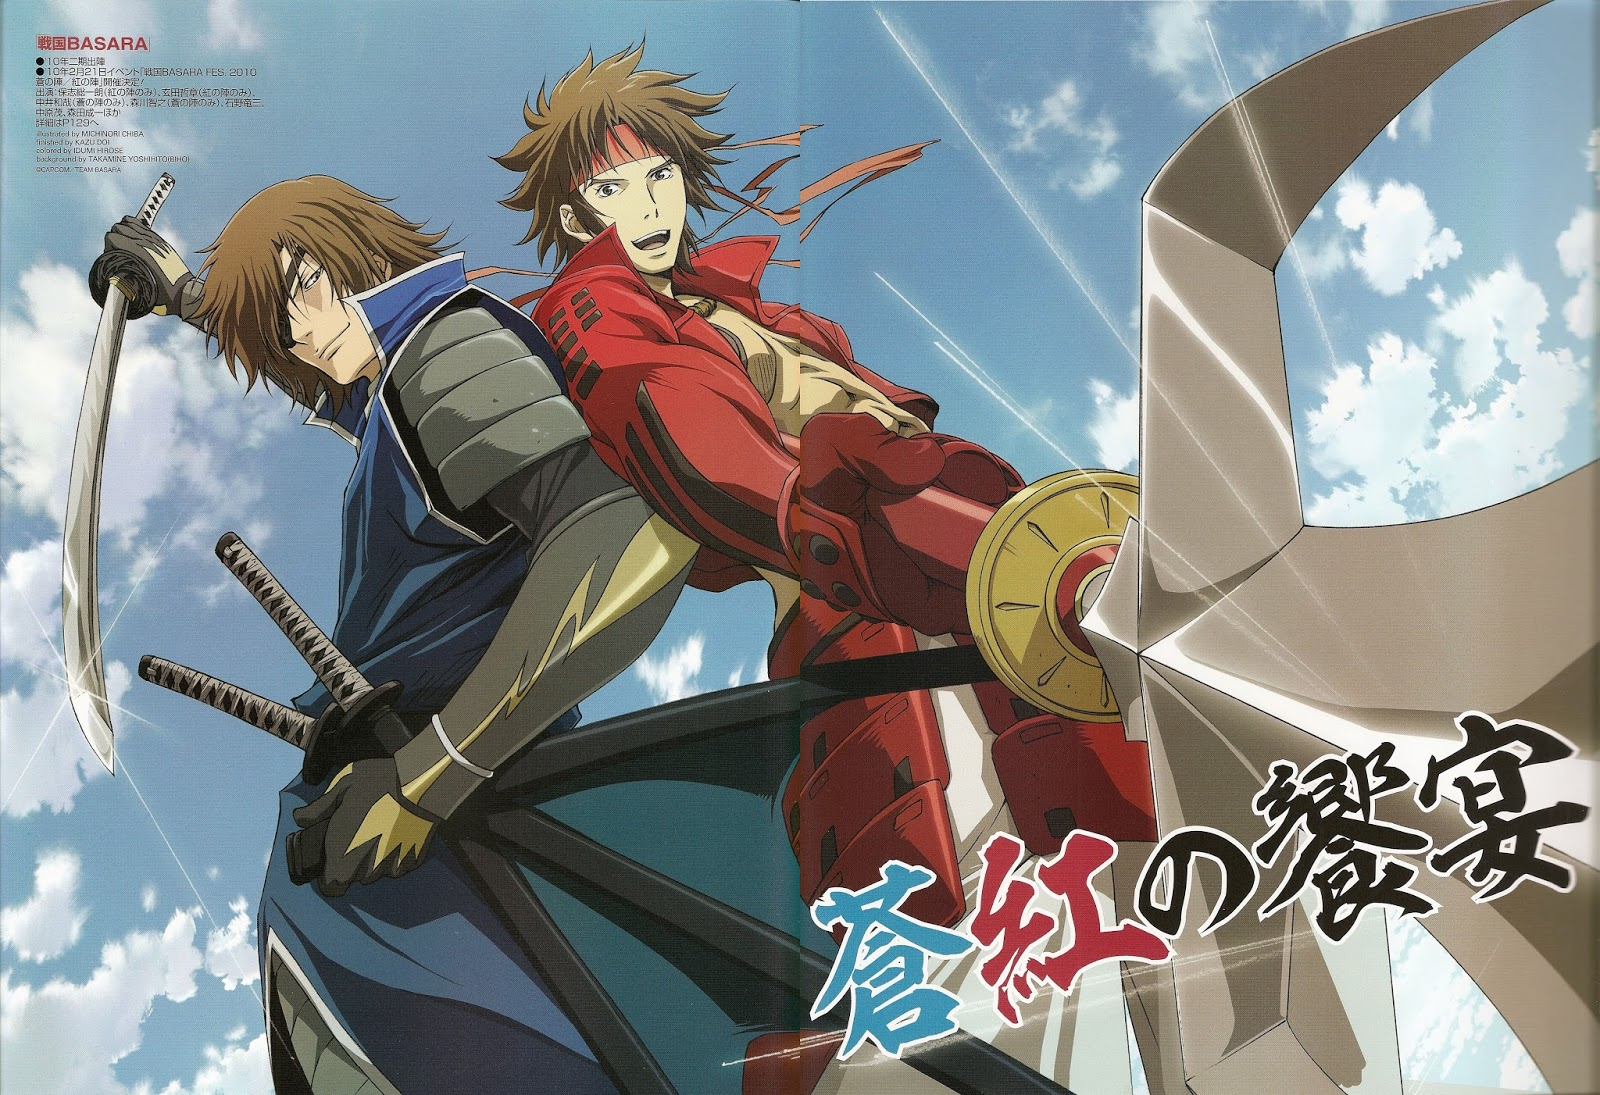 Yasuyuki Nekoi's Sengoku Basara Dokugan Spinoff Manga To End in June.